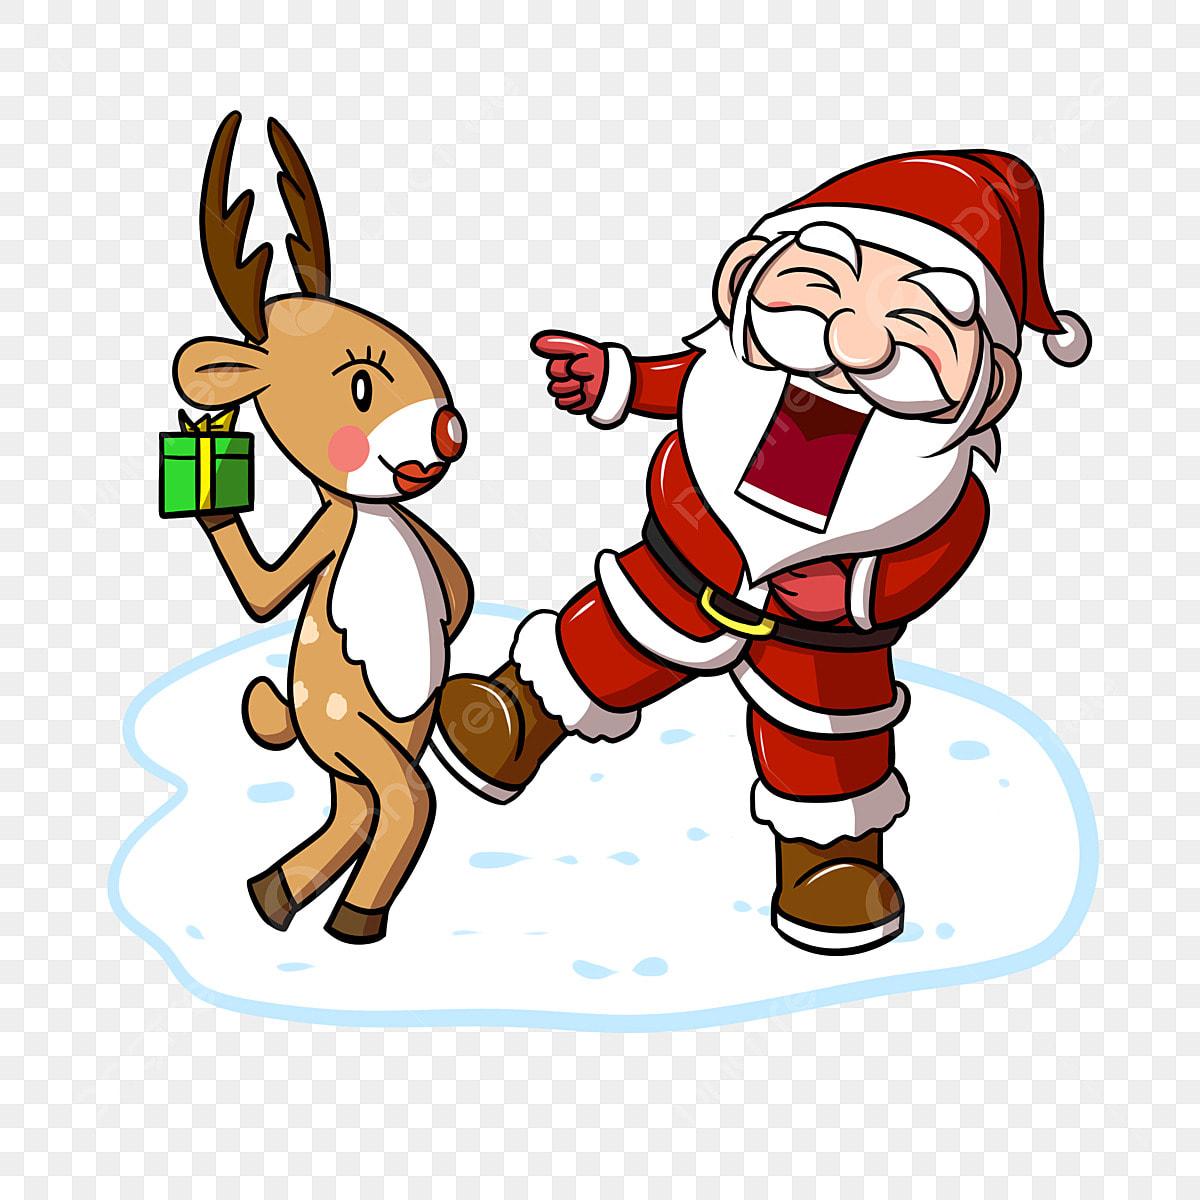 Christmas Humor Clip Art.Santa Claus Cartoon Reindeer Christmas Funny Winter Snow